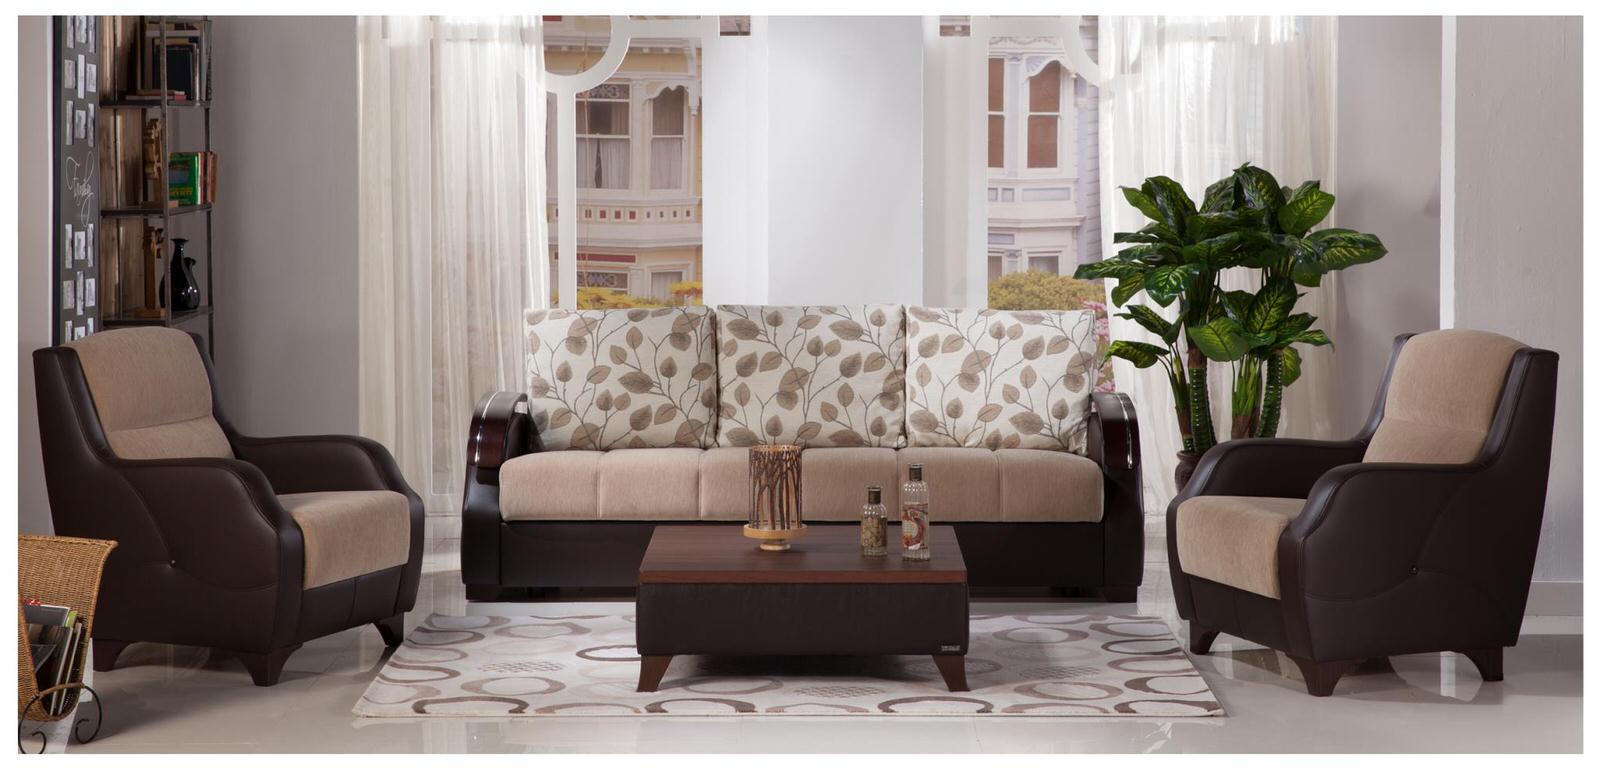 . Costa Armoni Vizon Sofa   2 Chairs Set by Sunset